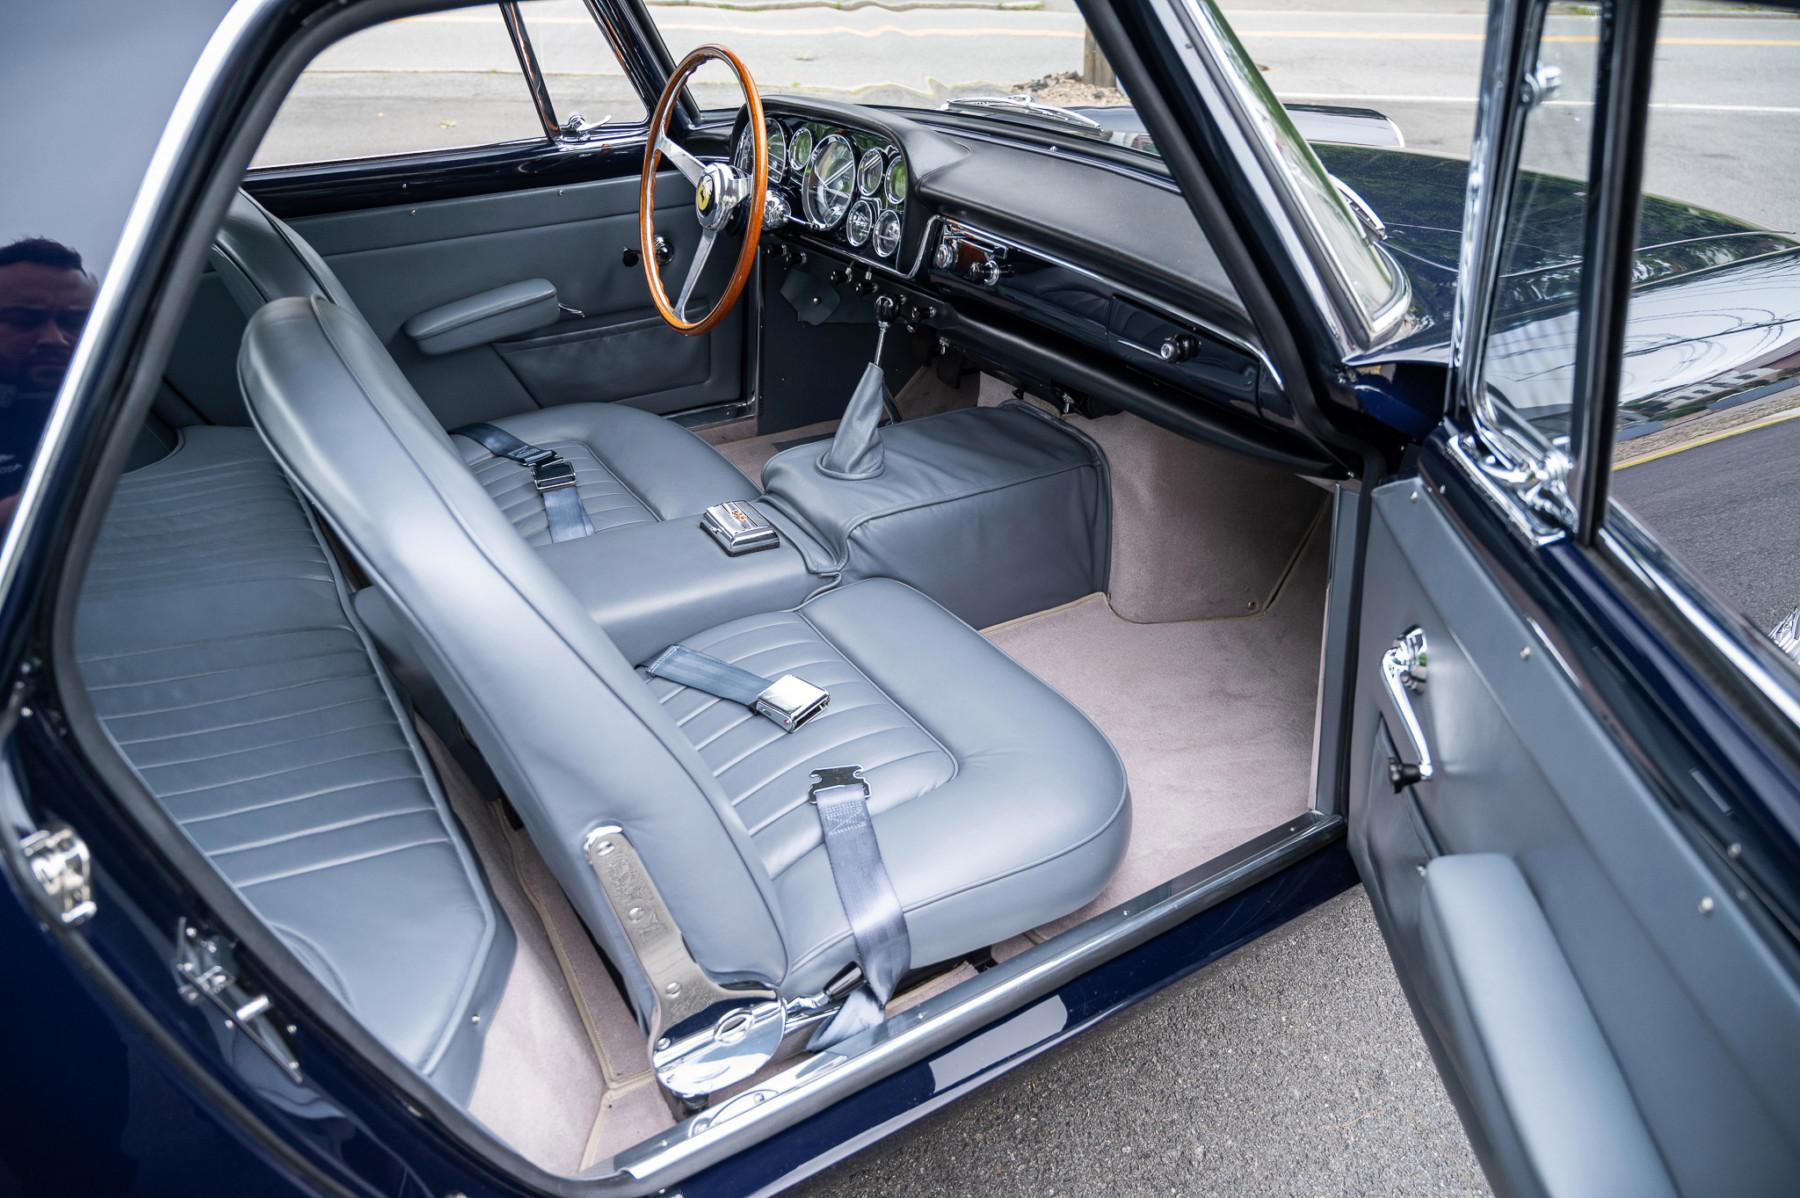 1960 Ferrari 250 GT Pinin Farina Coupe 12